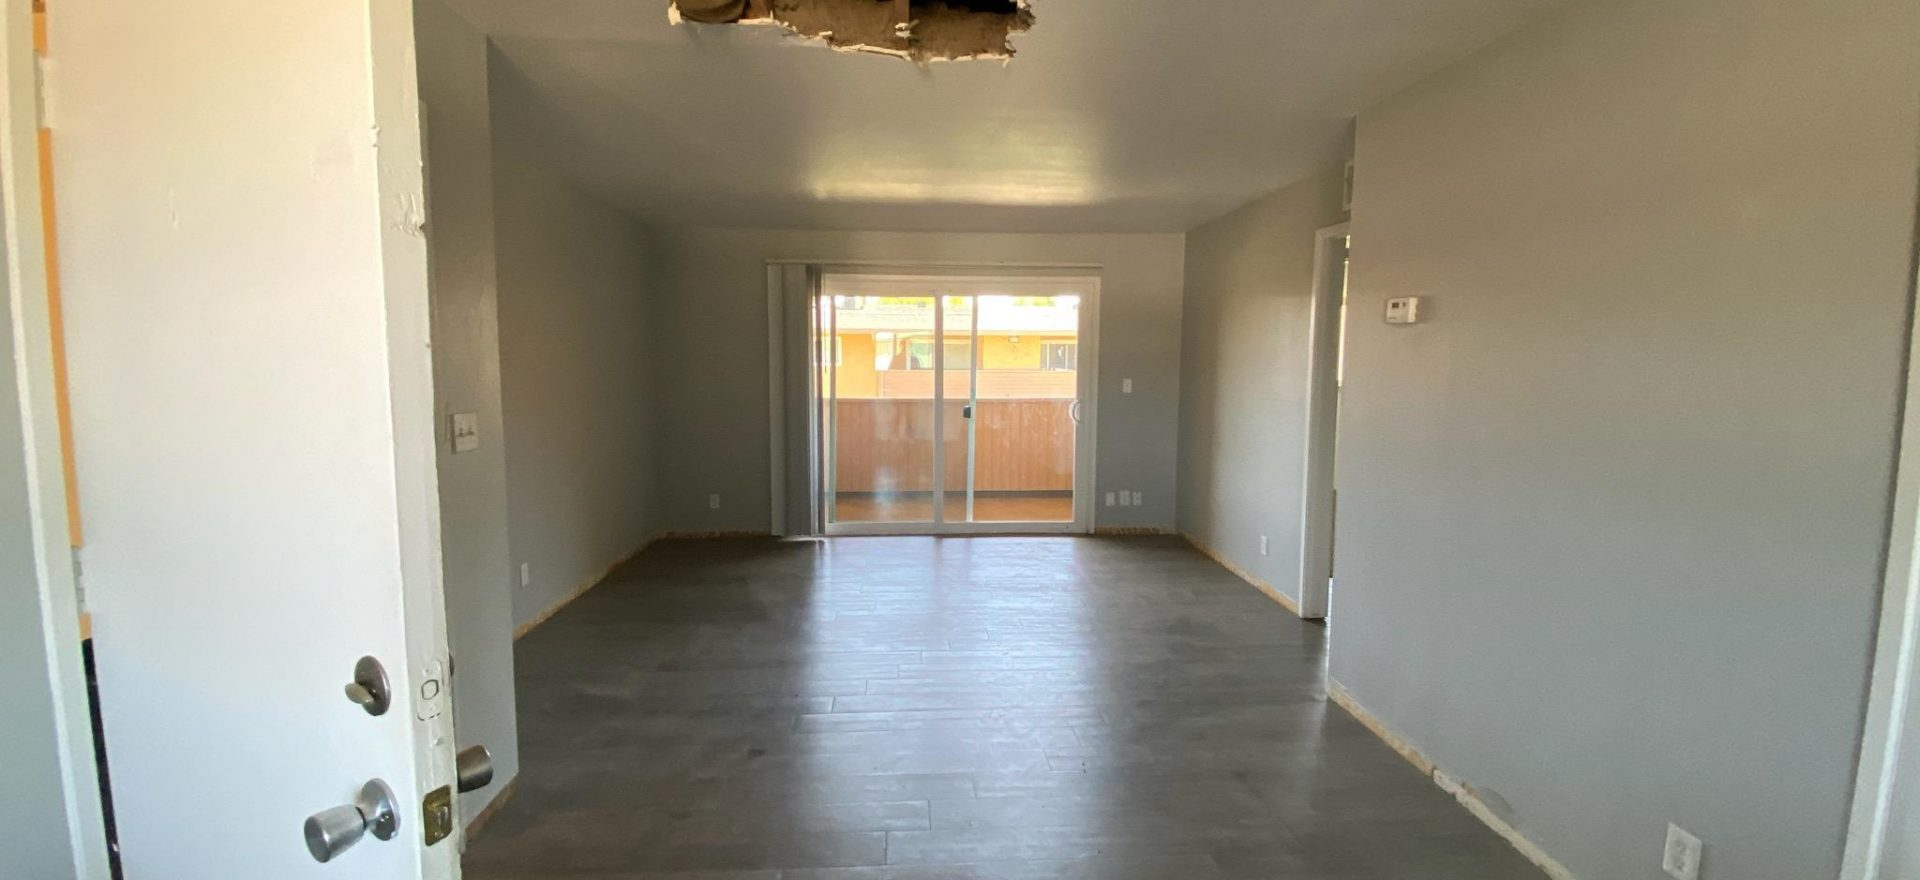 drywall-renovation-services-ca